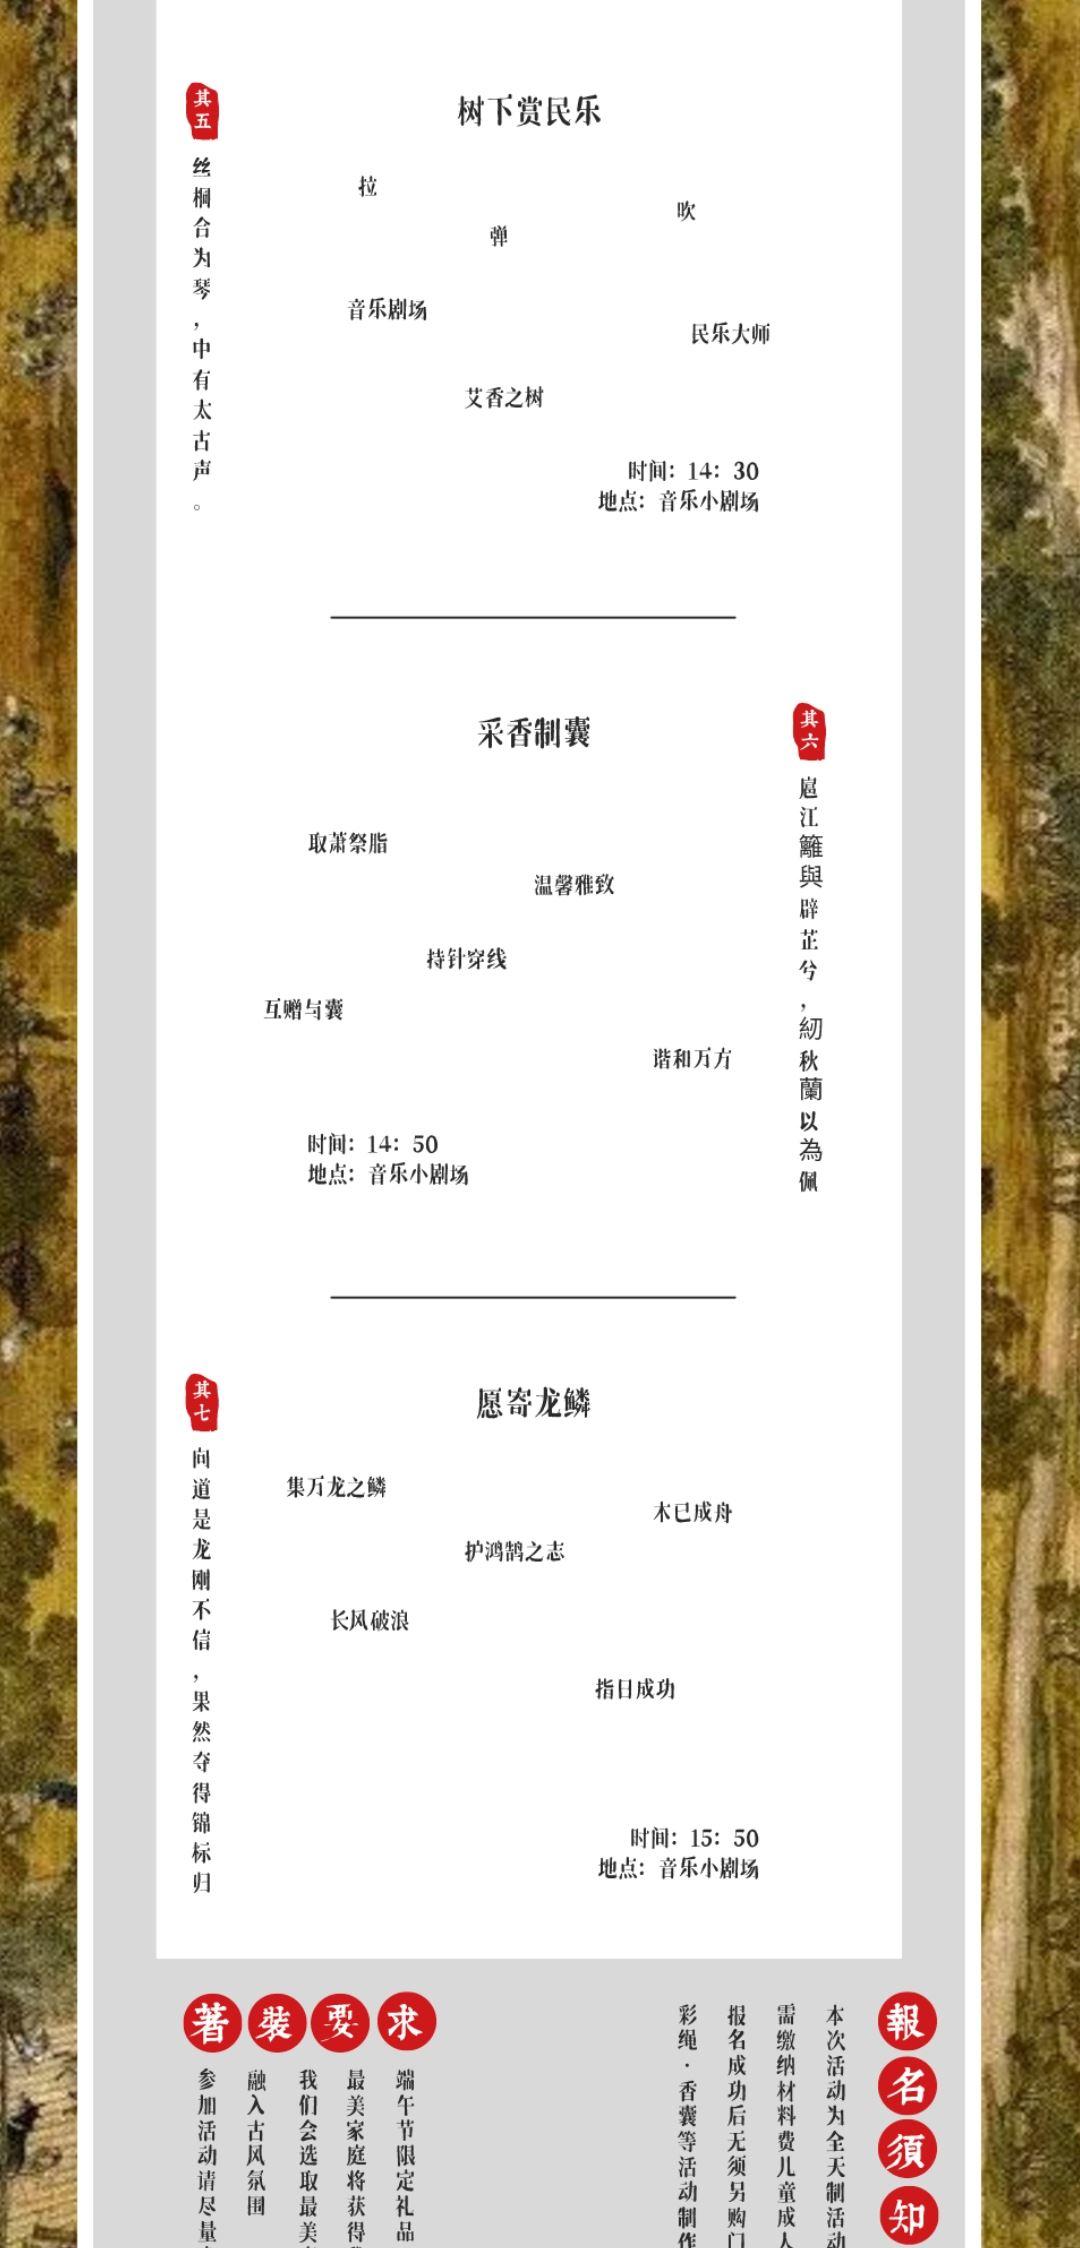 http://www.huodongxing.com/file/20210604/7594172474266/574175120760281.jpg